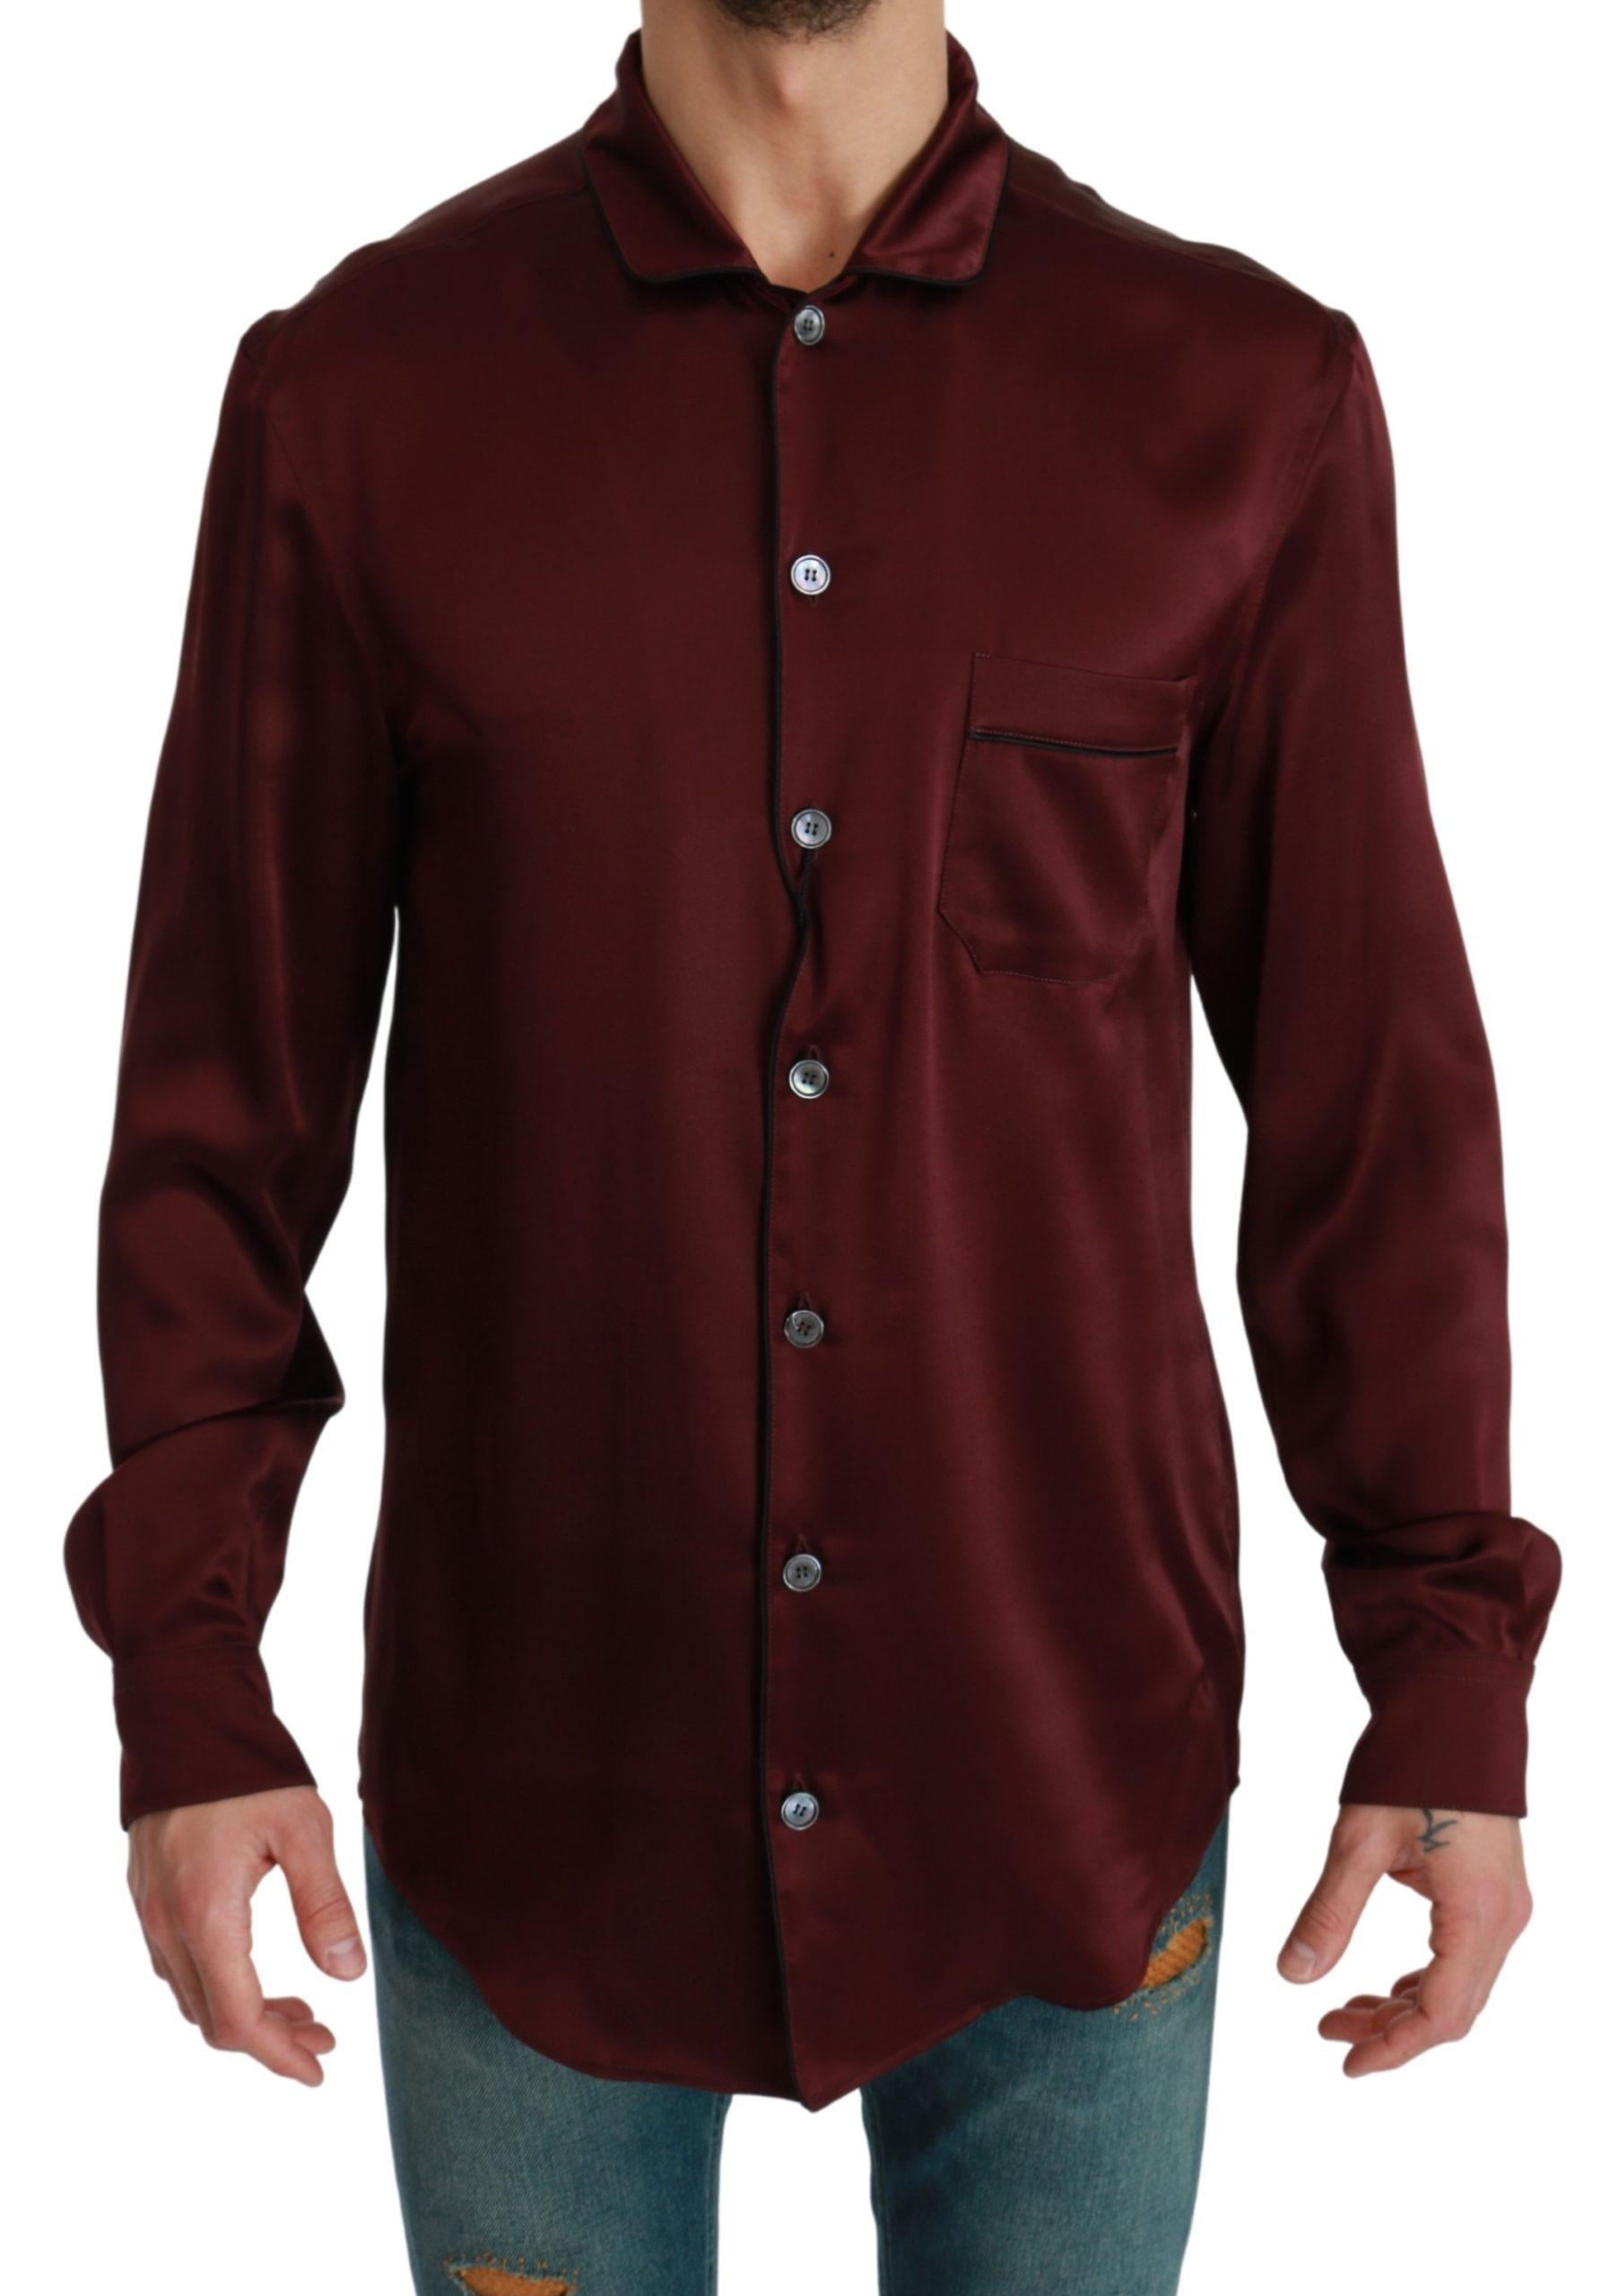 Dolce & Gabbana Men's Silk Pajama Casual Shirt Bordeaux TSH4616 - IT39 | S